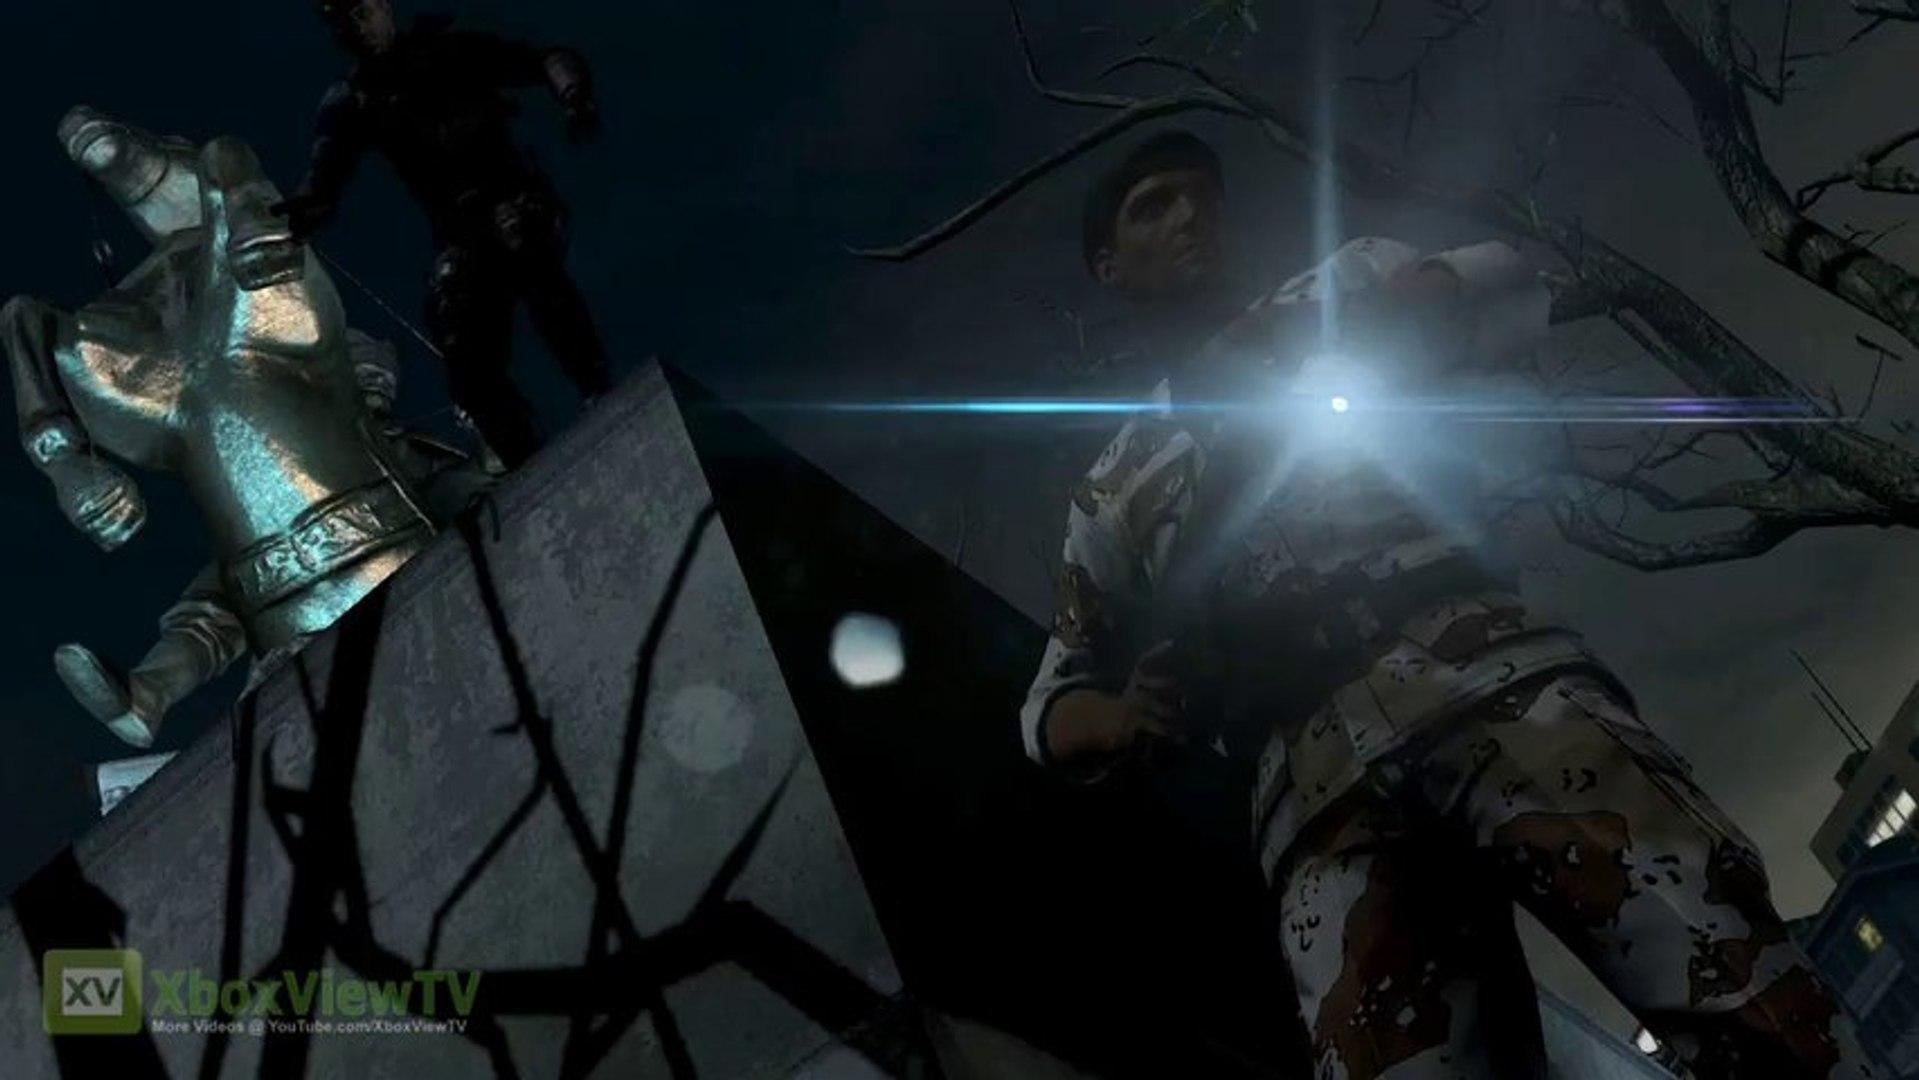 Splinter Cell Blacklist | Launch Trailer [DE] (2013) | HD